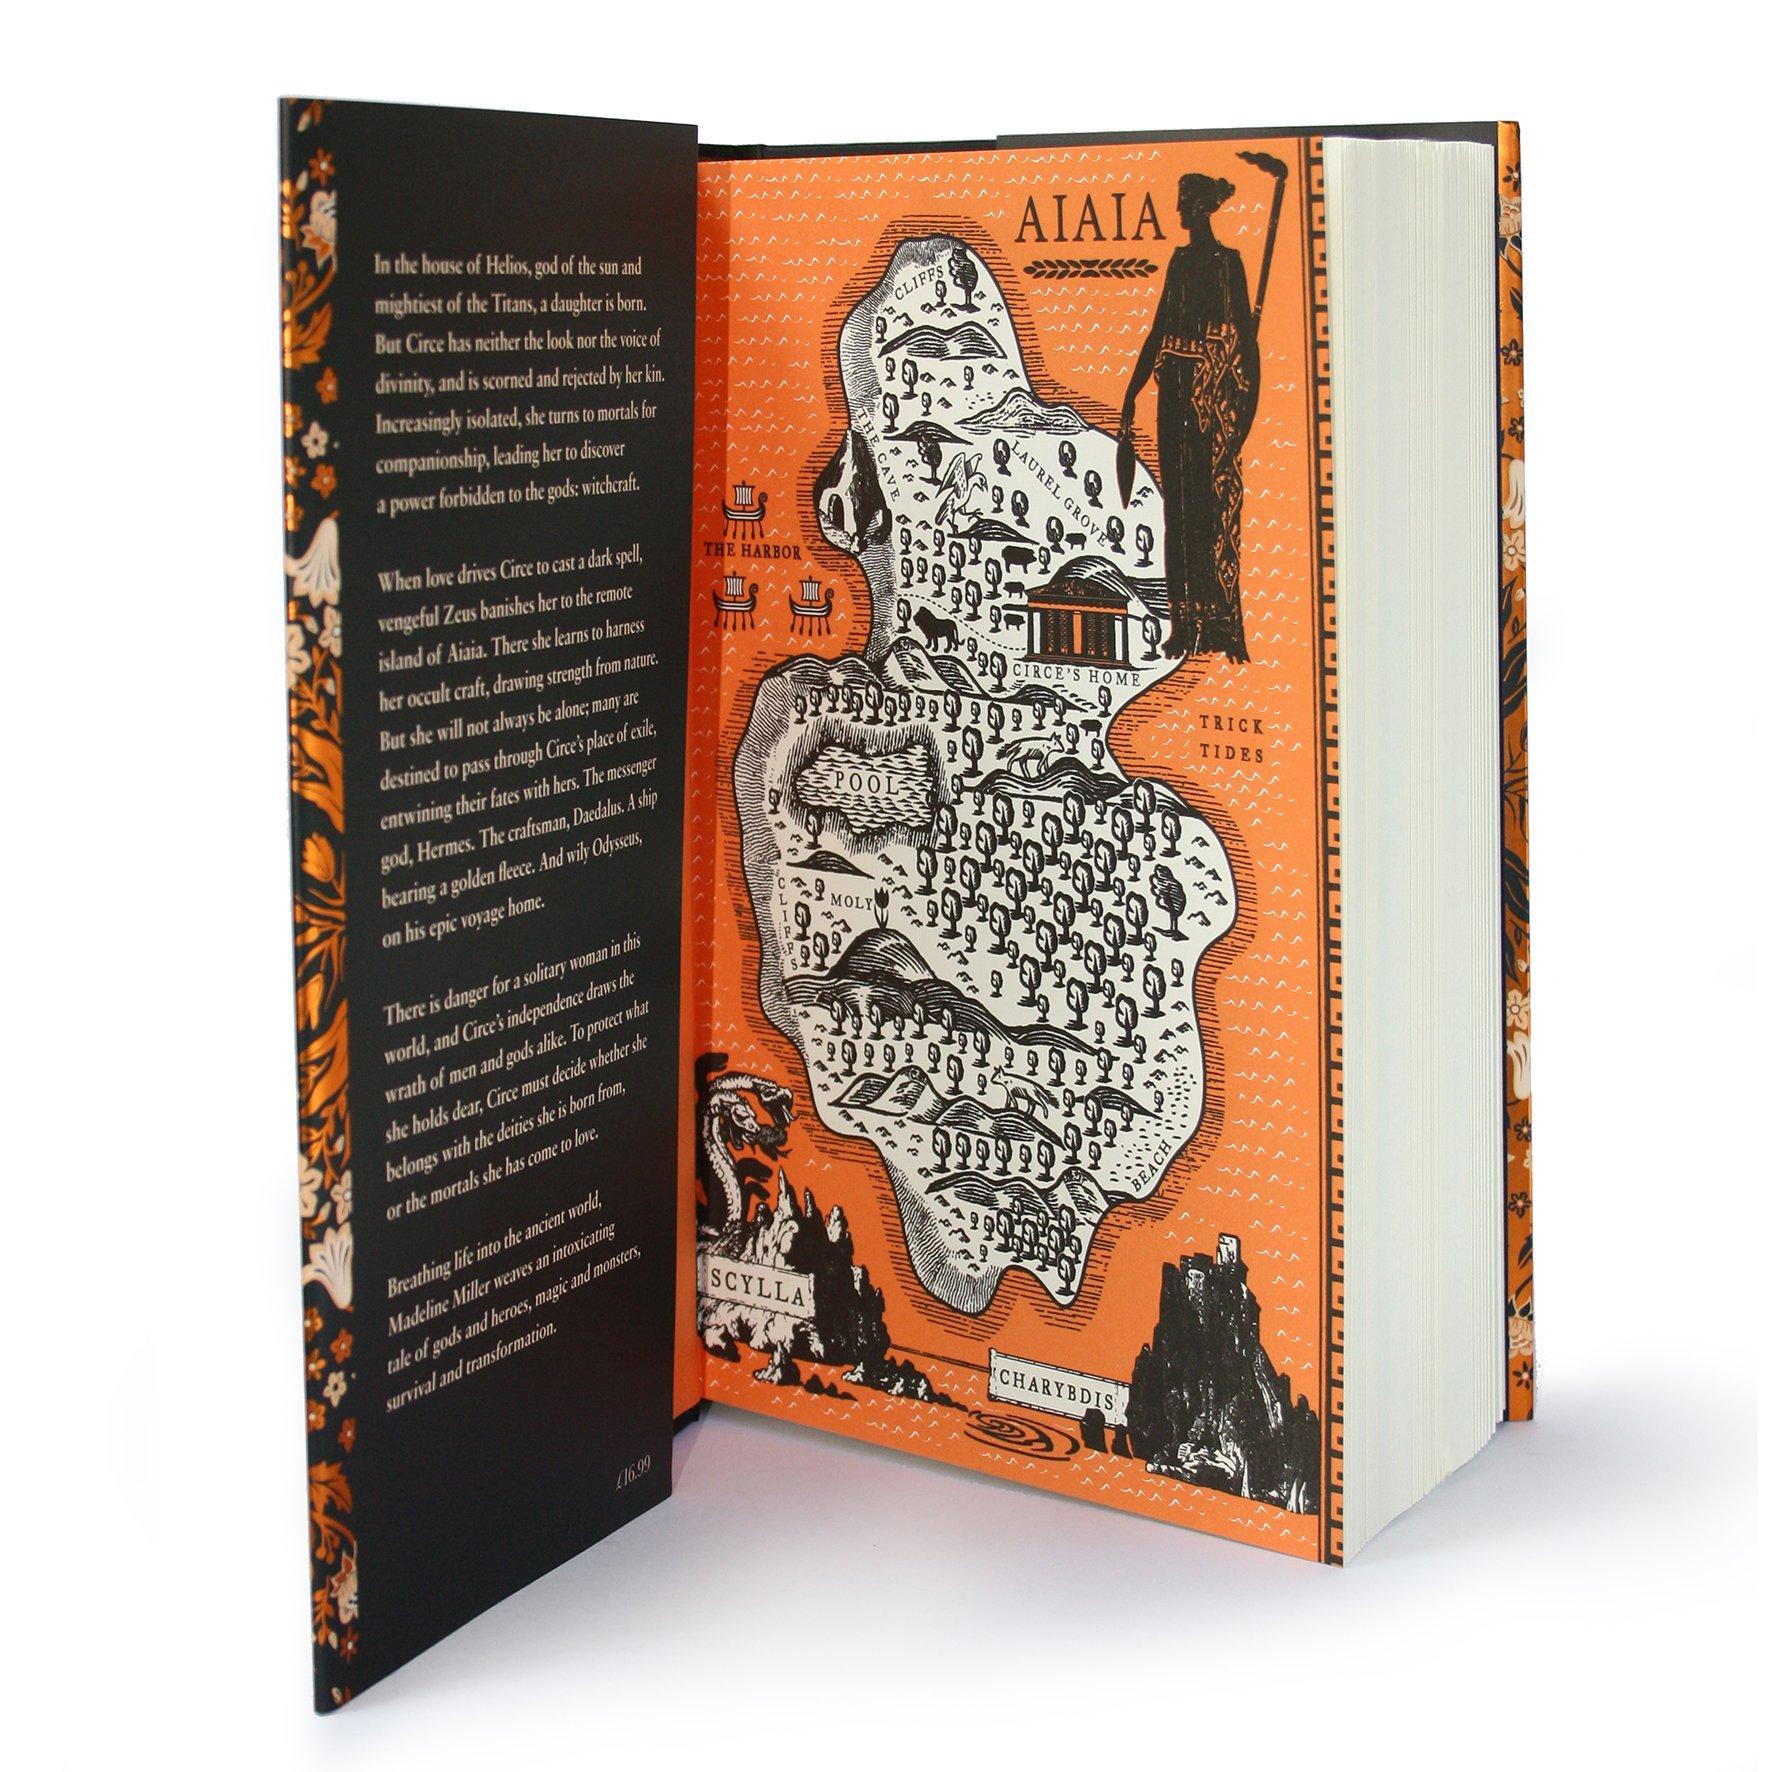 Buy Circe The International No 1 Bestseller Shortlisted